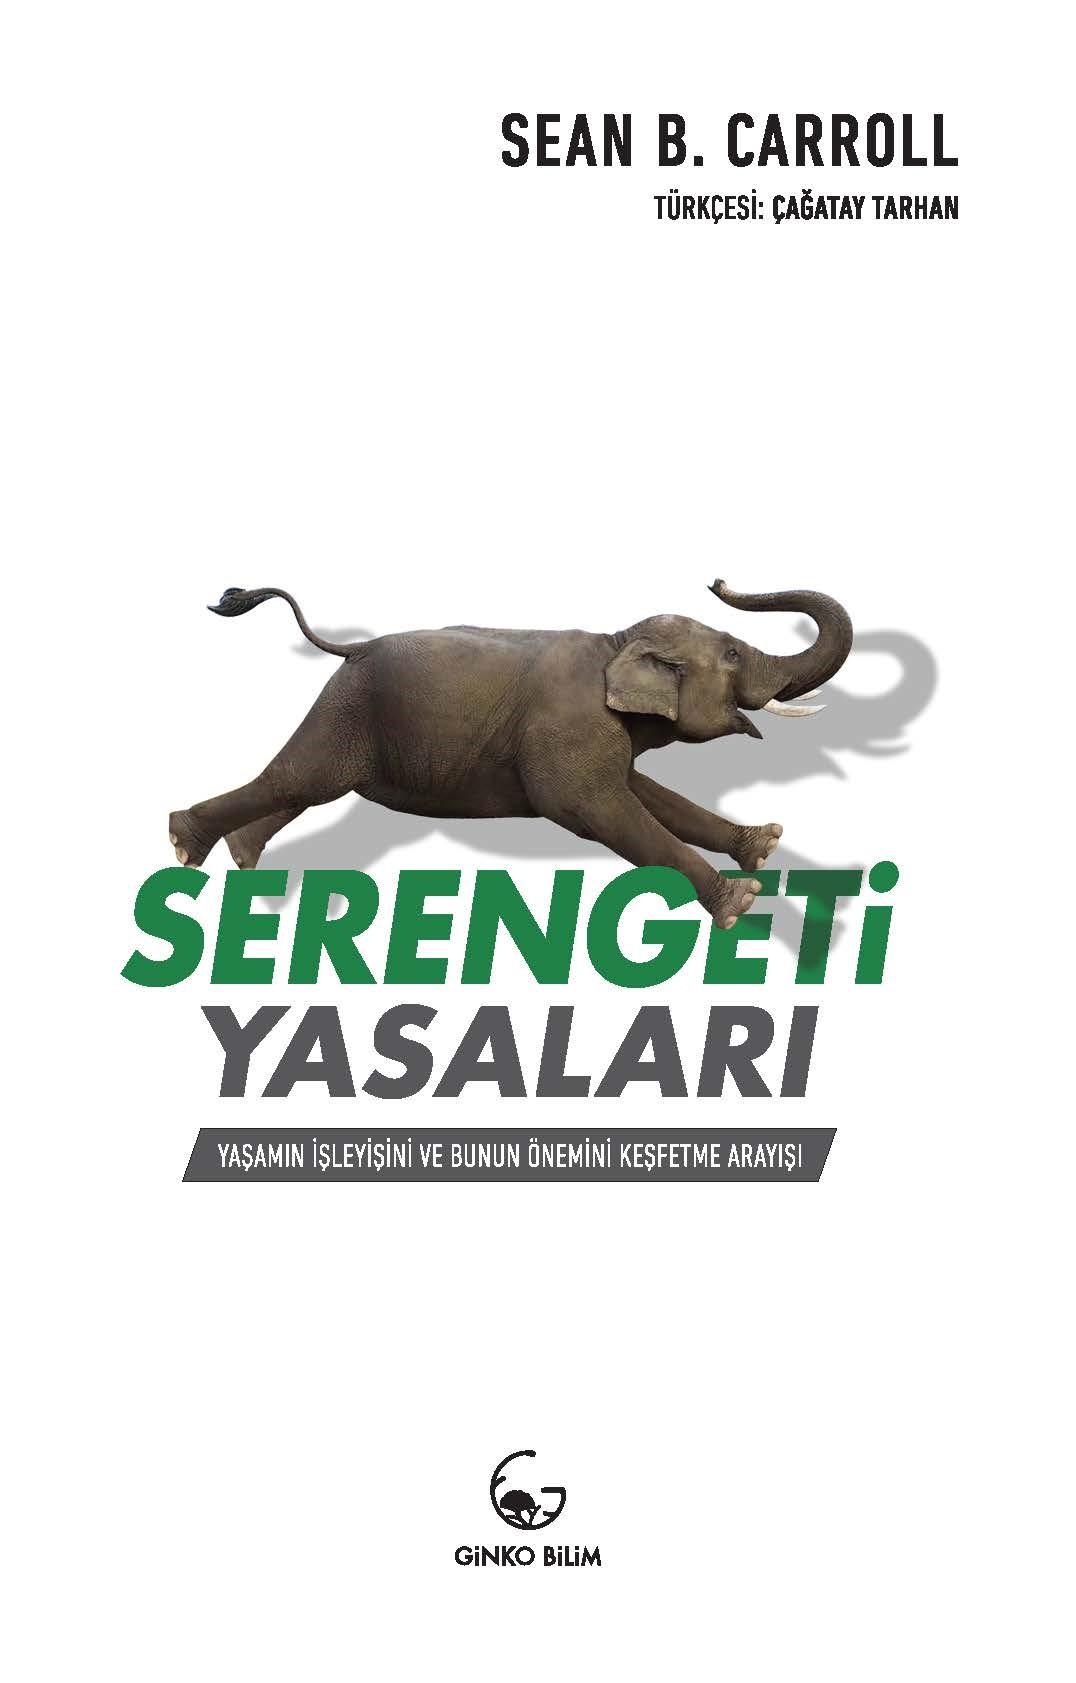 Serengeti yasaları ginko bilim